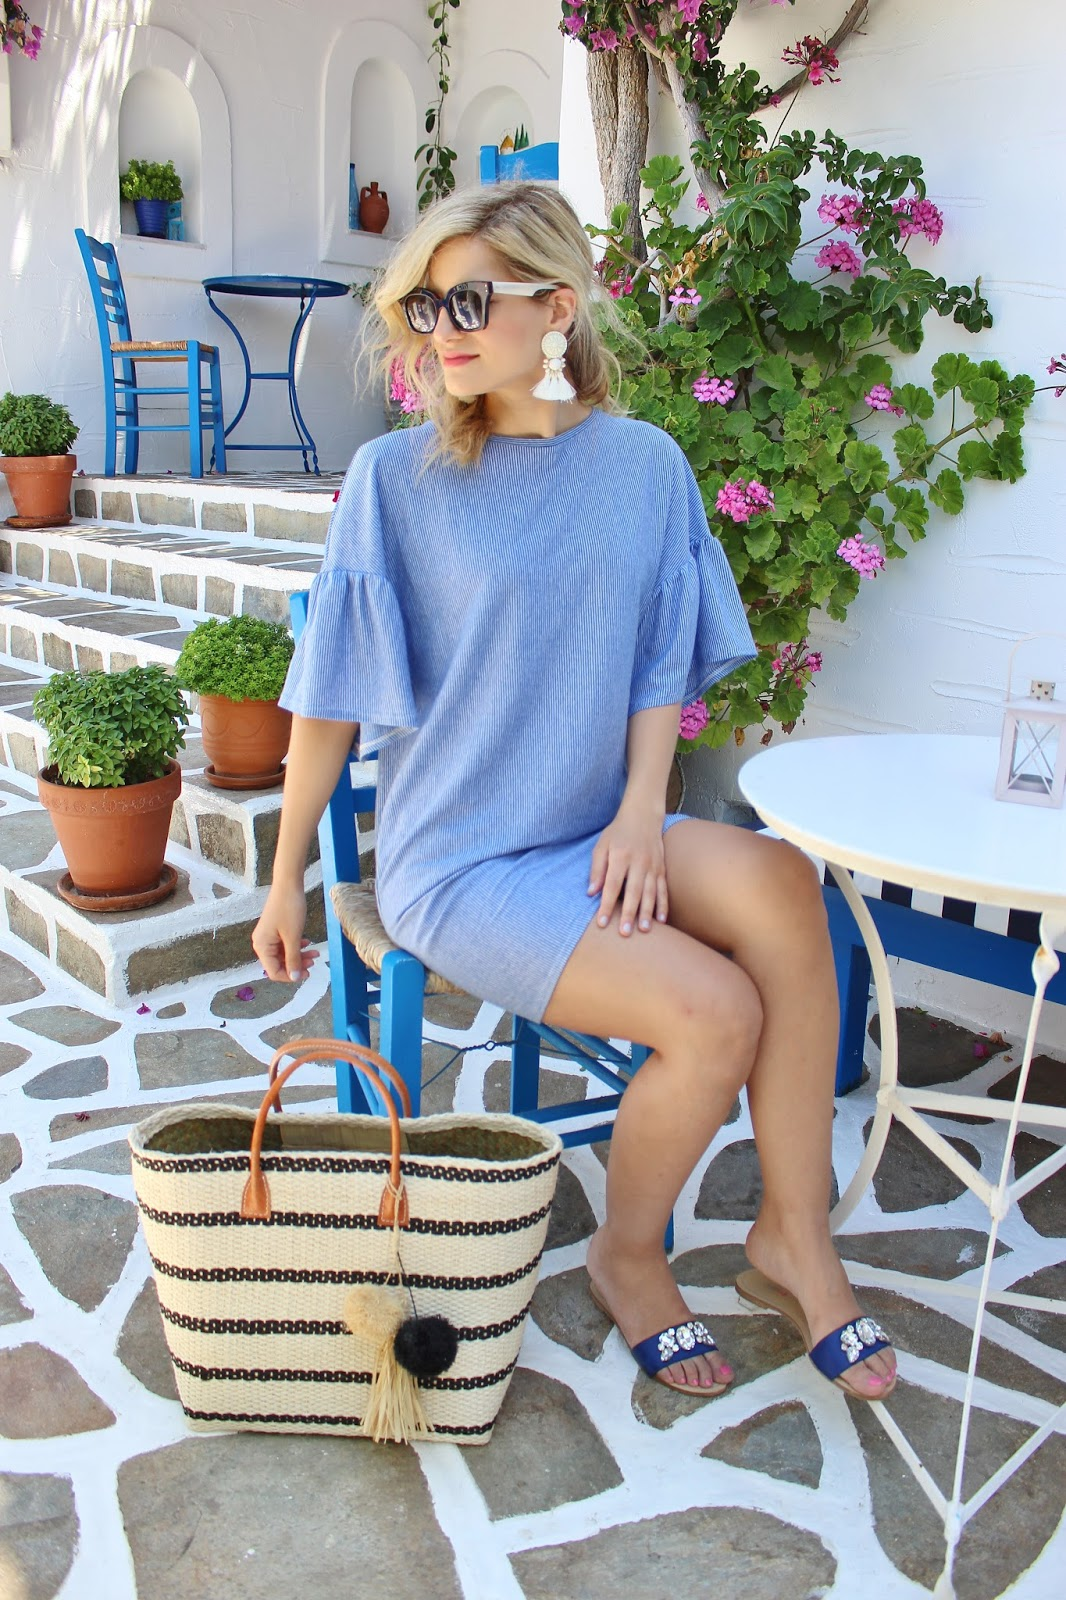 bijuleni, Zara summer dress and hat attack straw beach bag